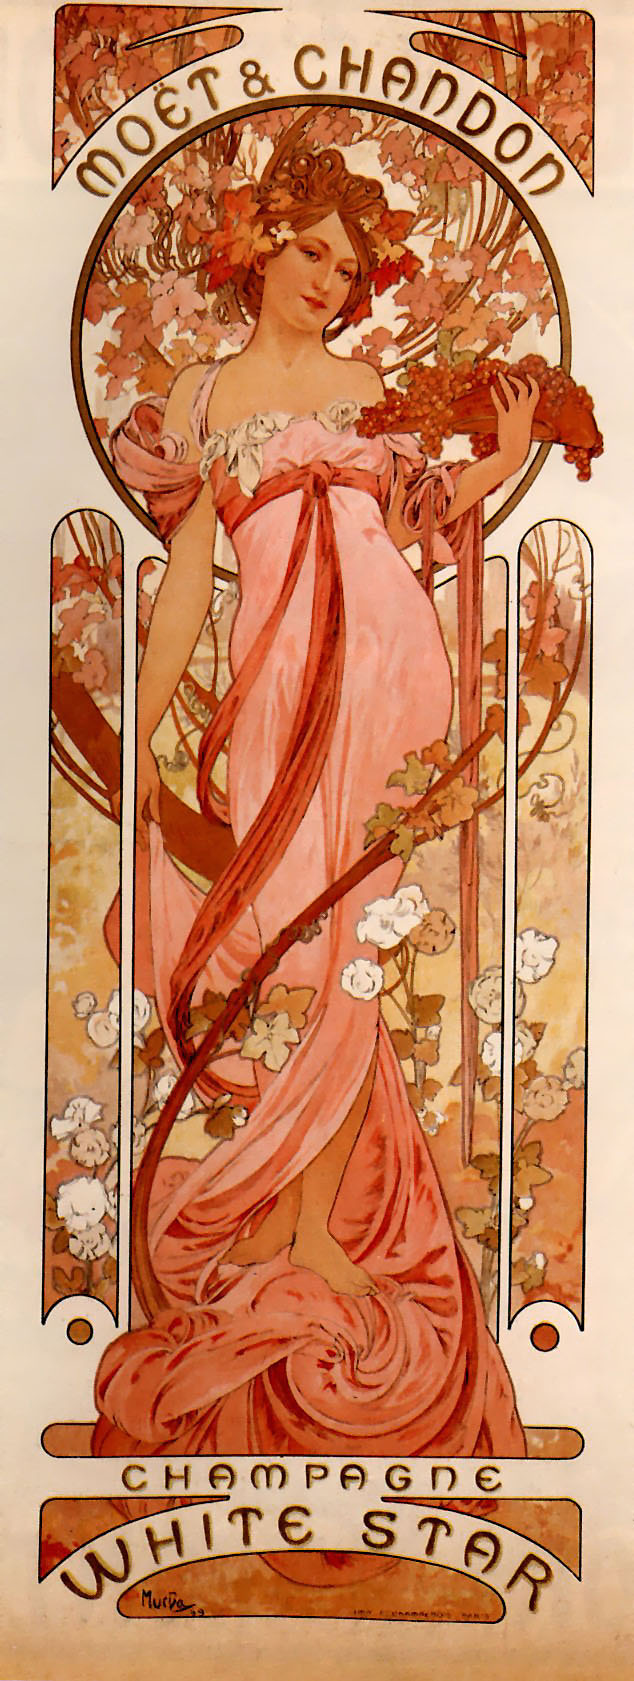 Artiste & œuvre d'art du jour Mucha-Mo%C3%ABt_&_Chandon_White_Star-1899